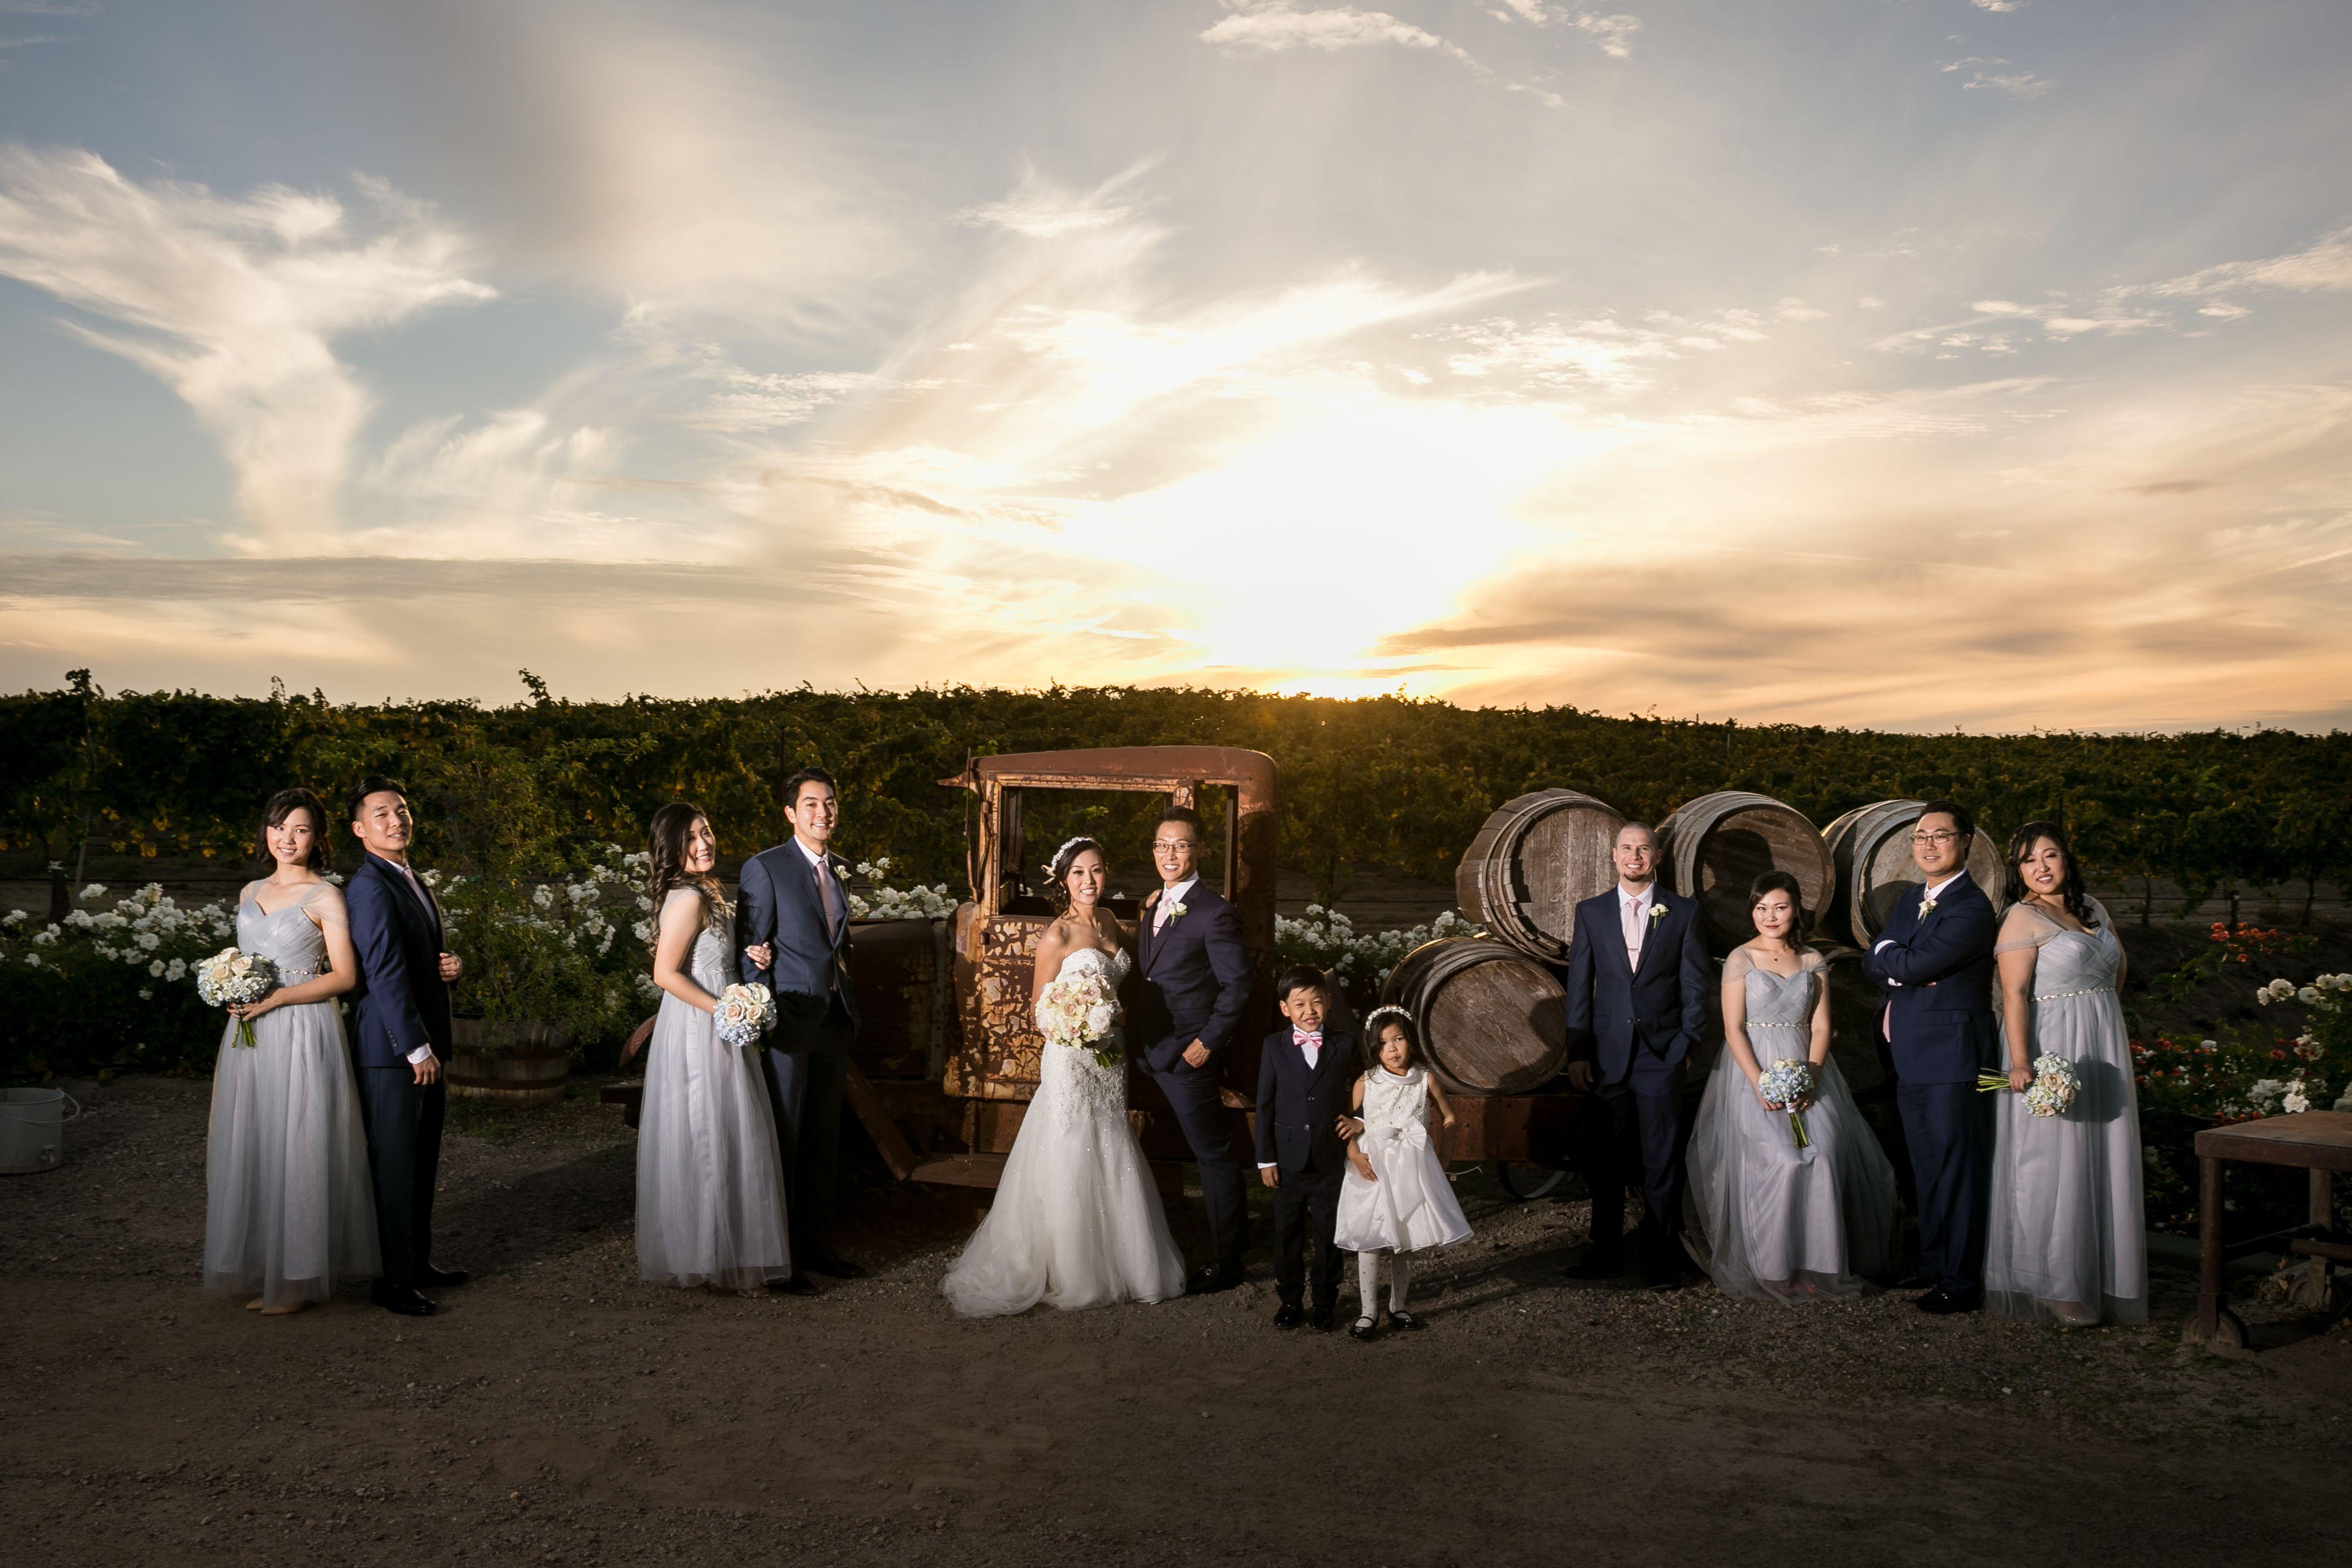 Villa De Amore Temecula Weddings Lin and Jirsa Riverside